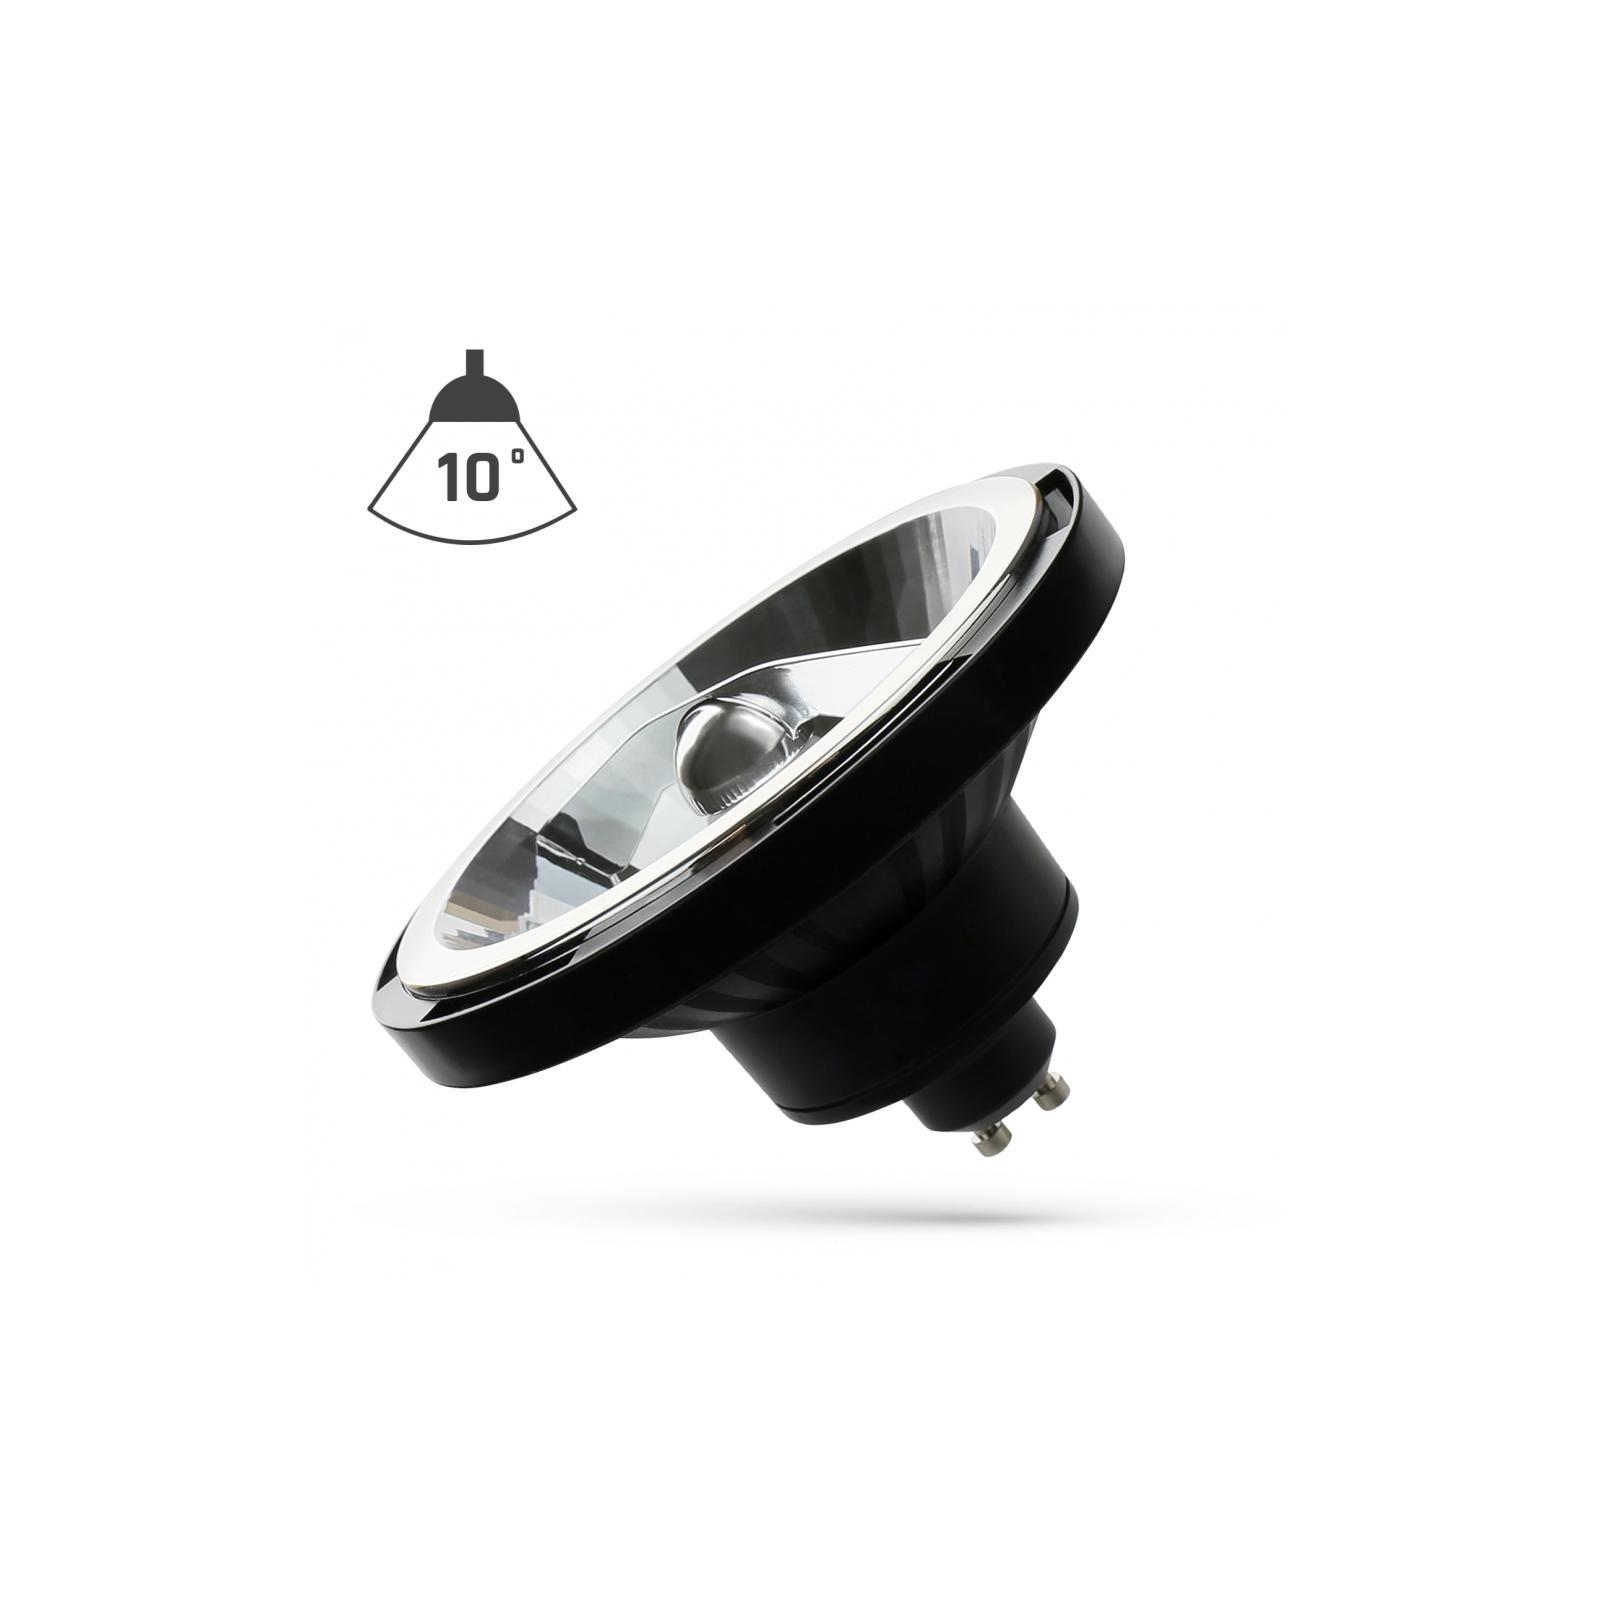 LED AR111 GU10 230V 15W COB 10ST Teplá bílá Černá SPECTRUM